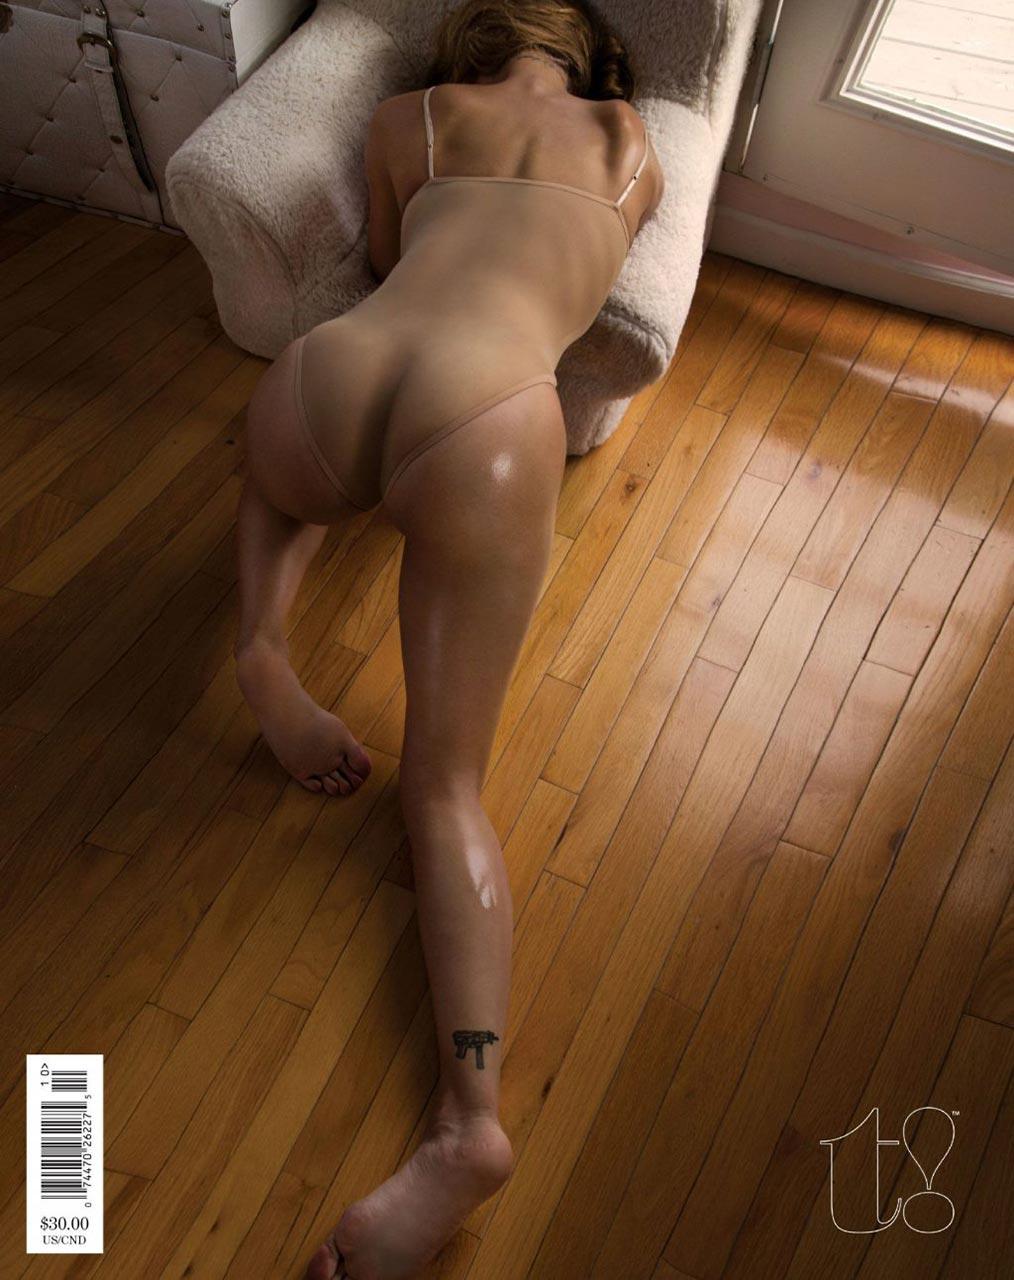 naked (97 photos), Paparazzi Celebrity pics